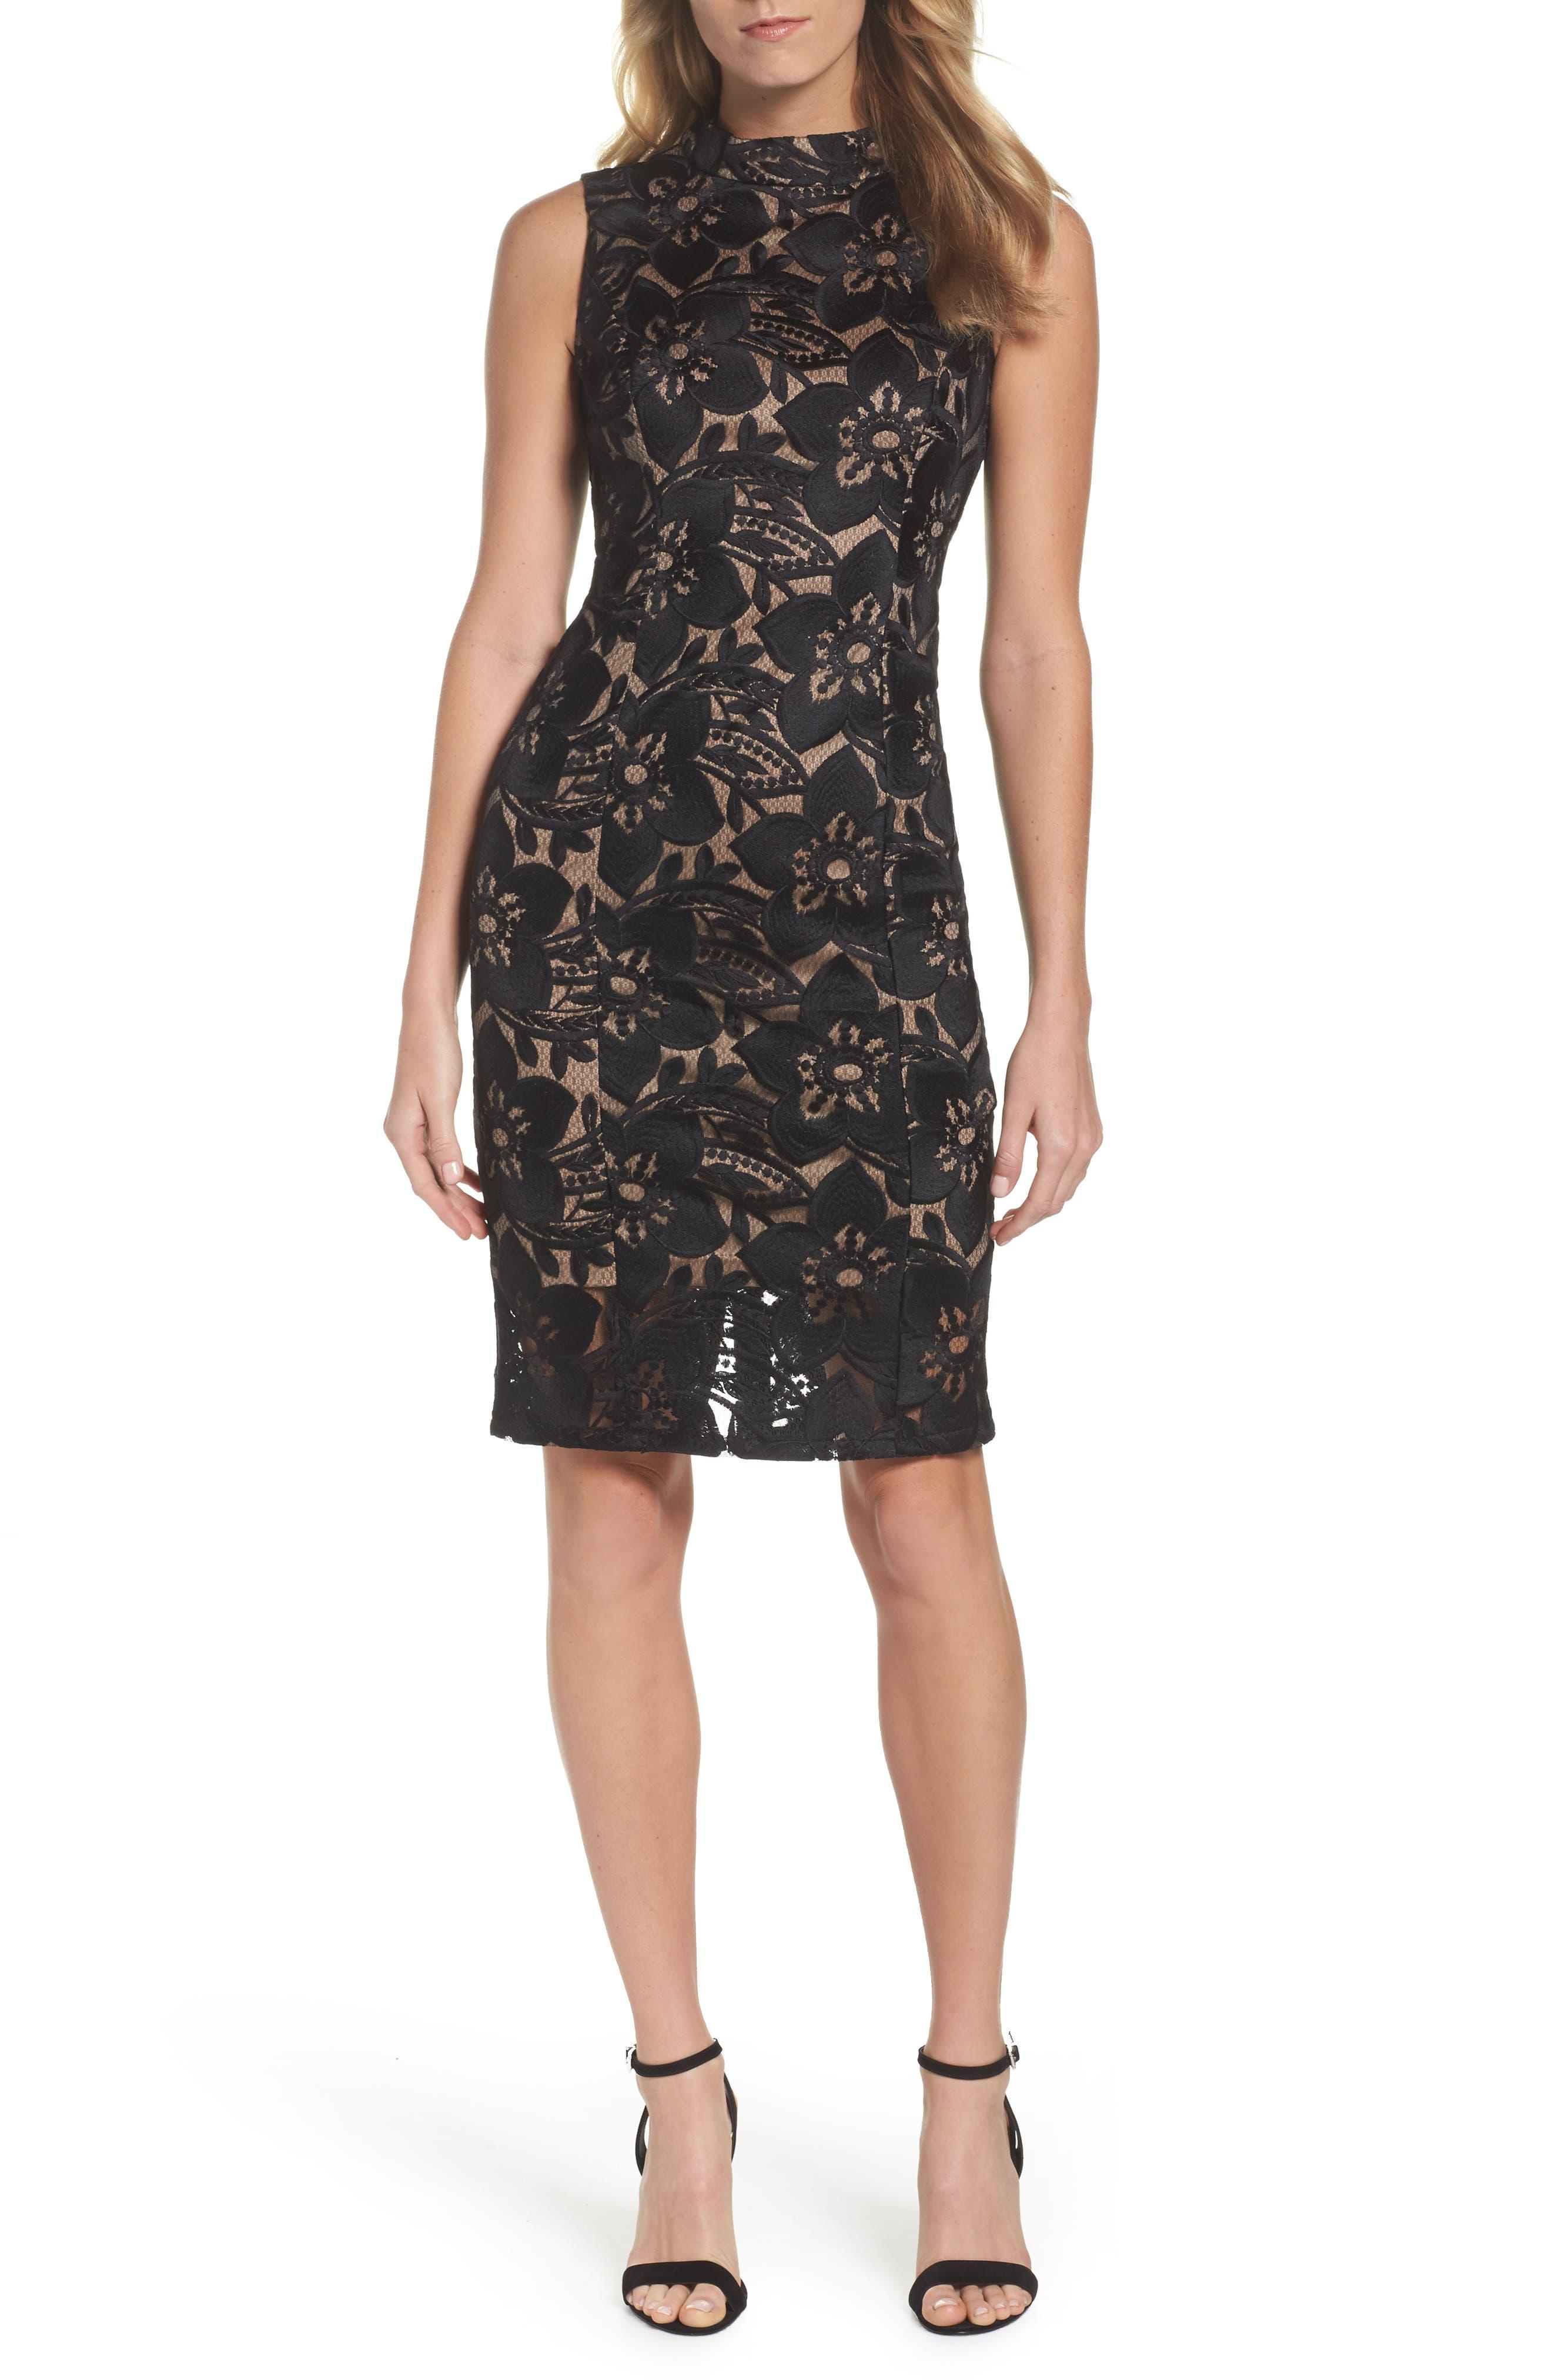 ADRIANNA PAPELL,                             Lace Sheath Dress,                             Main thumbnail 1, color,                             002